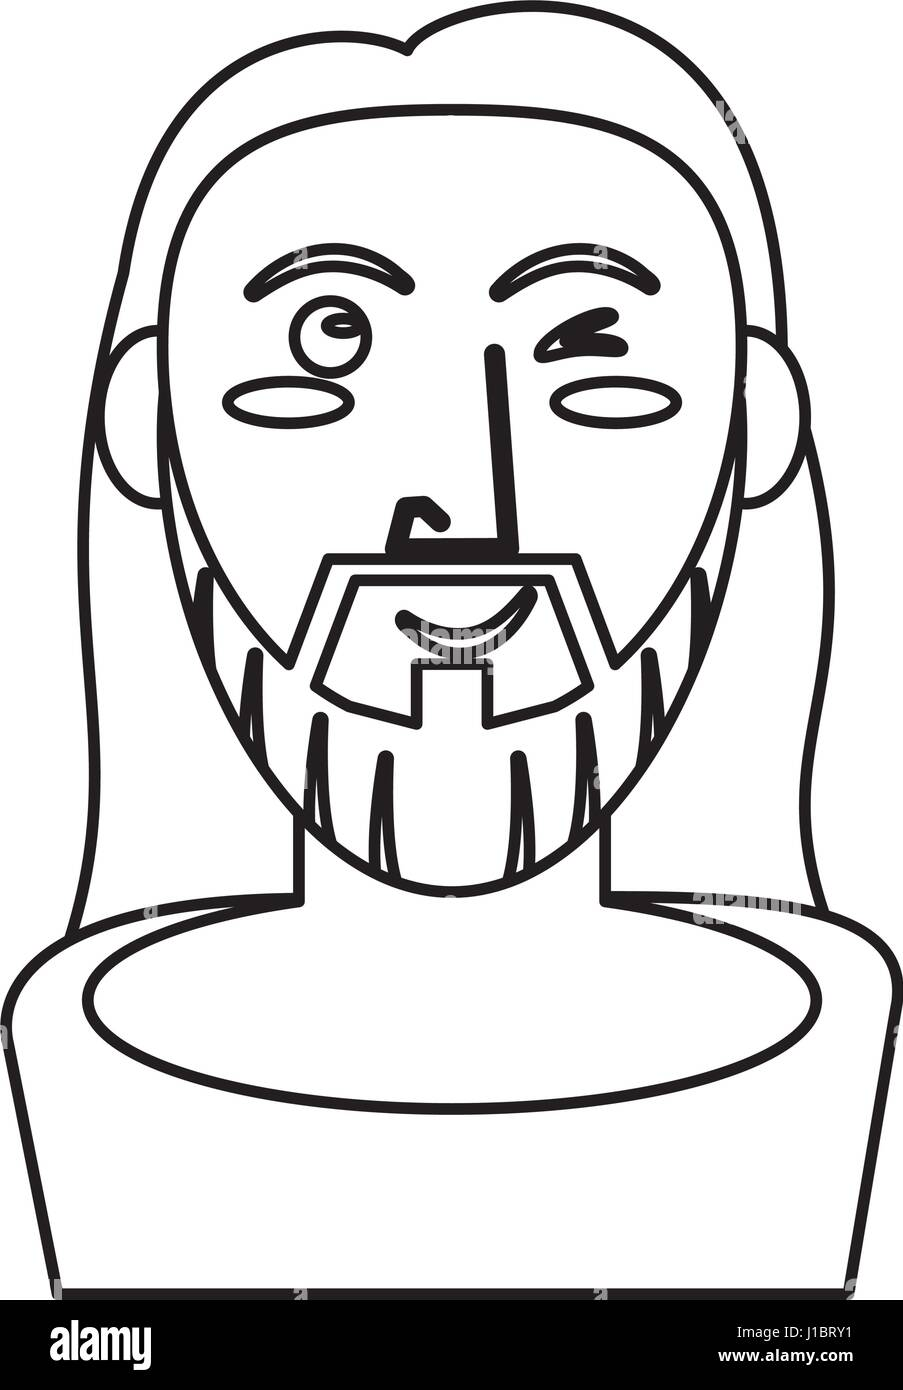 Jesus christ catholic symbol outline stock vector art jesus christ catholic symbol outline buycottarizona Image collections